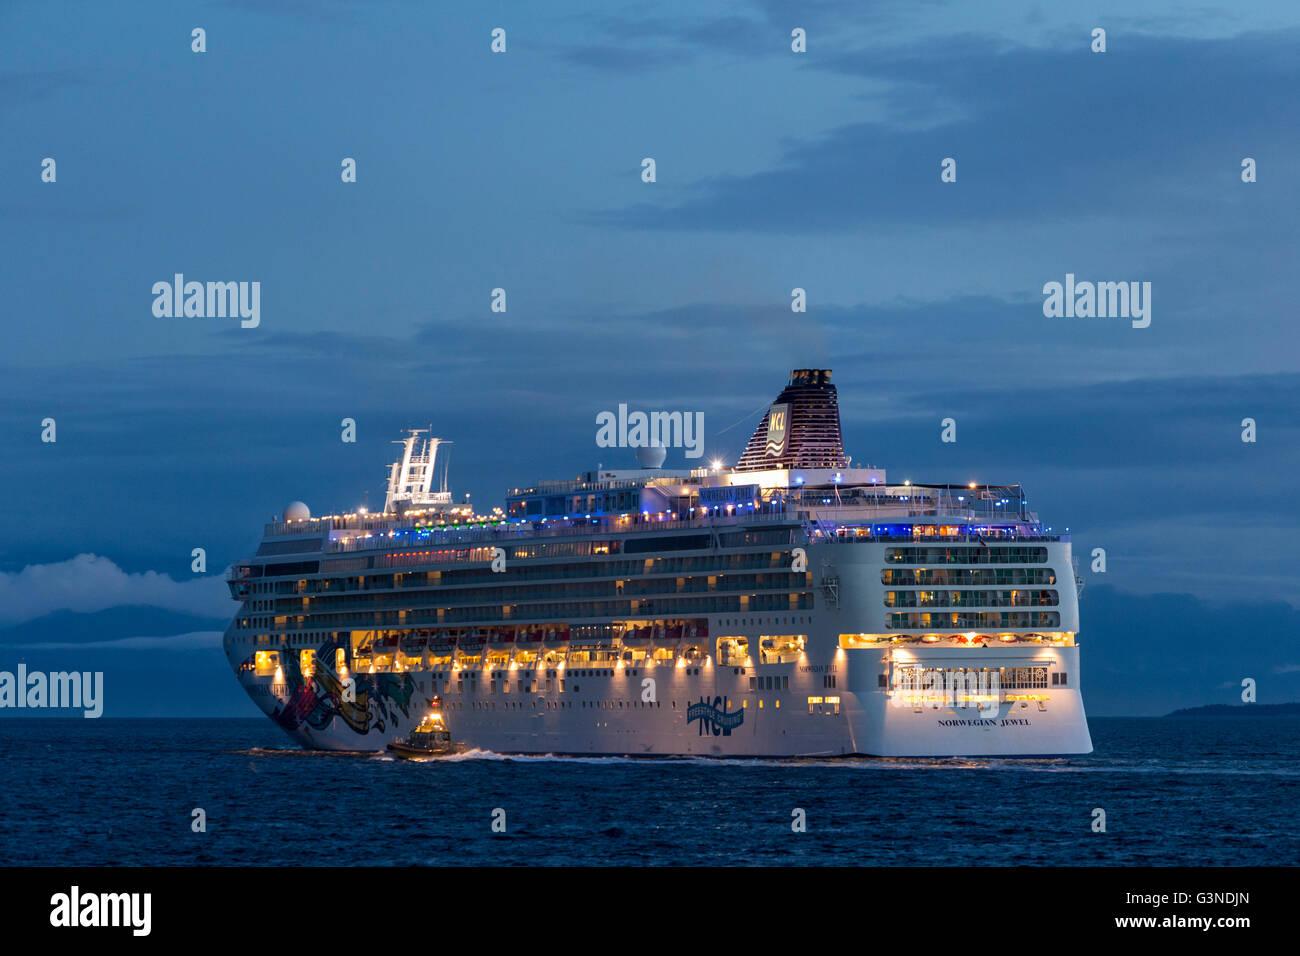 Cruise ship Norwegian Jewel leaving port of Victoria on Salish Sea-Victoria, British Columbia, Canada. - Stock Image